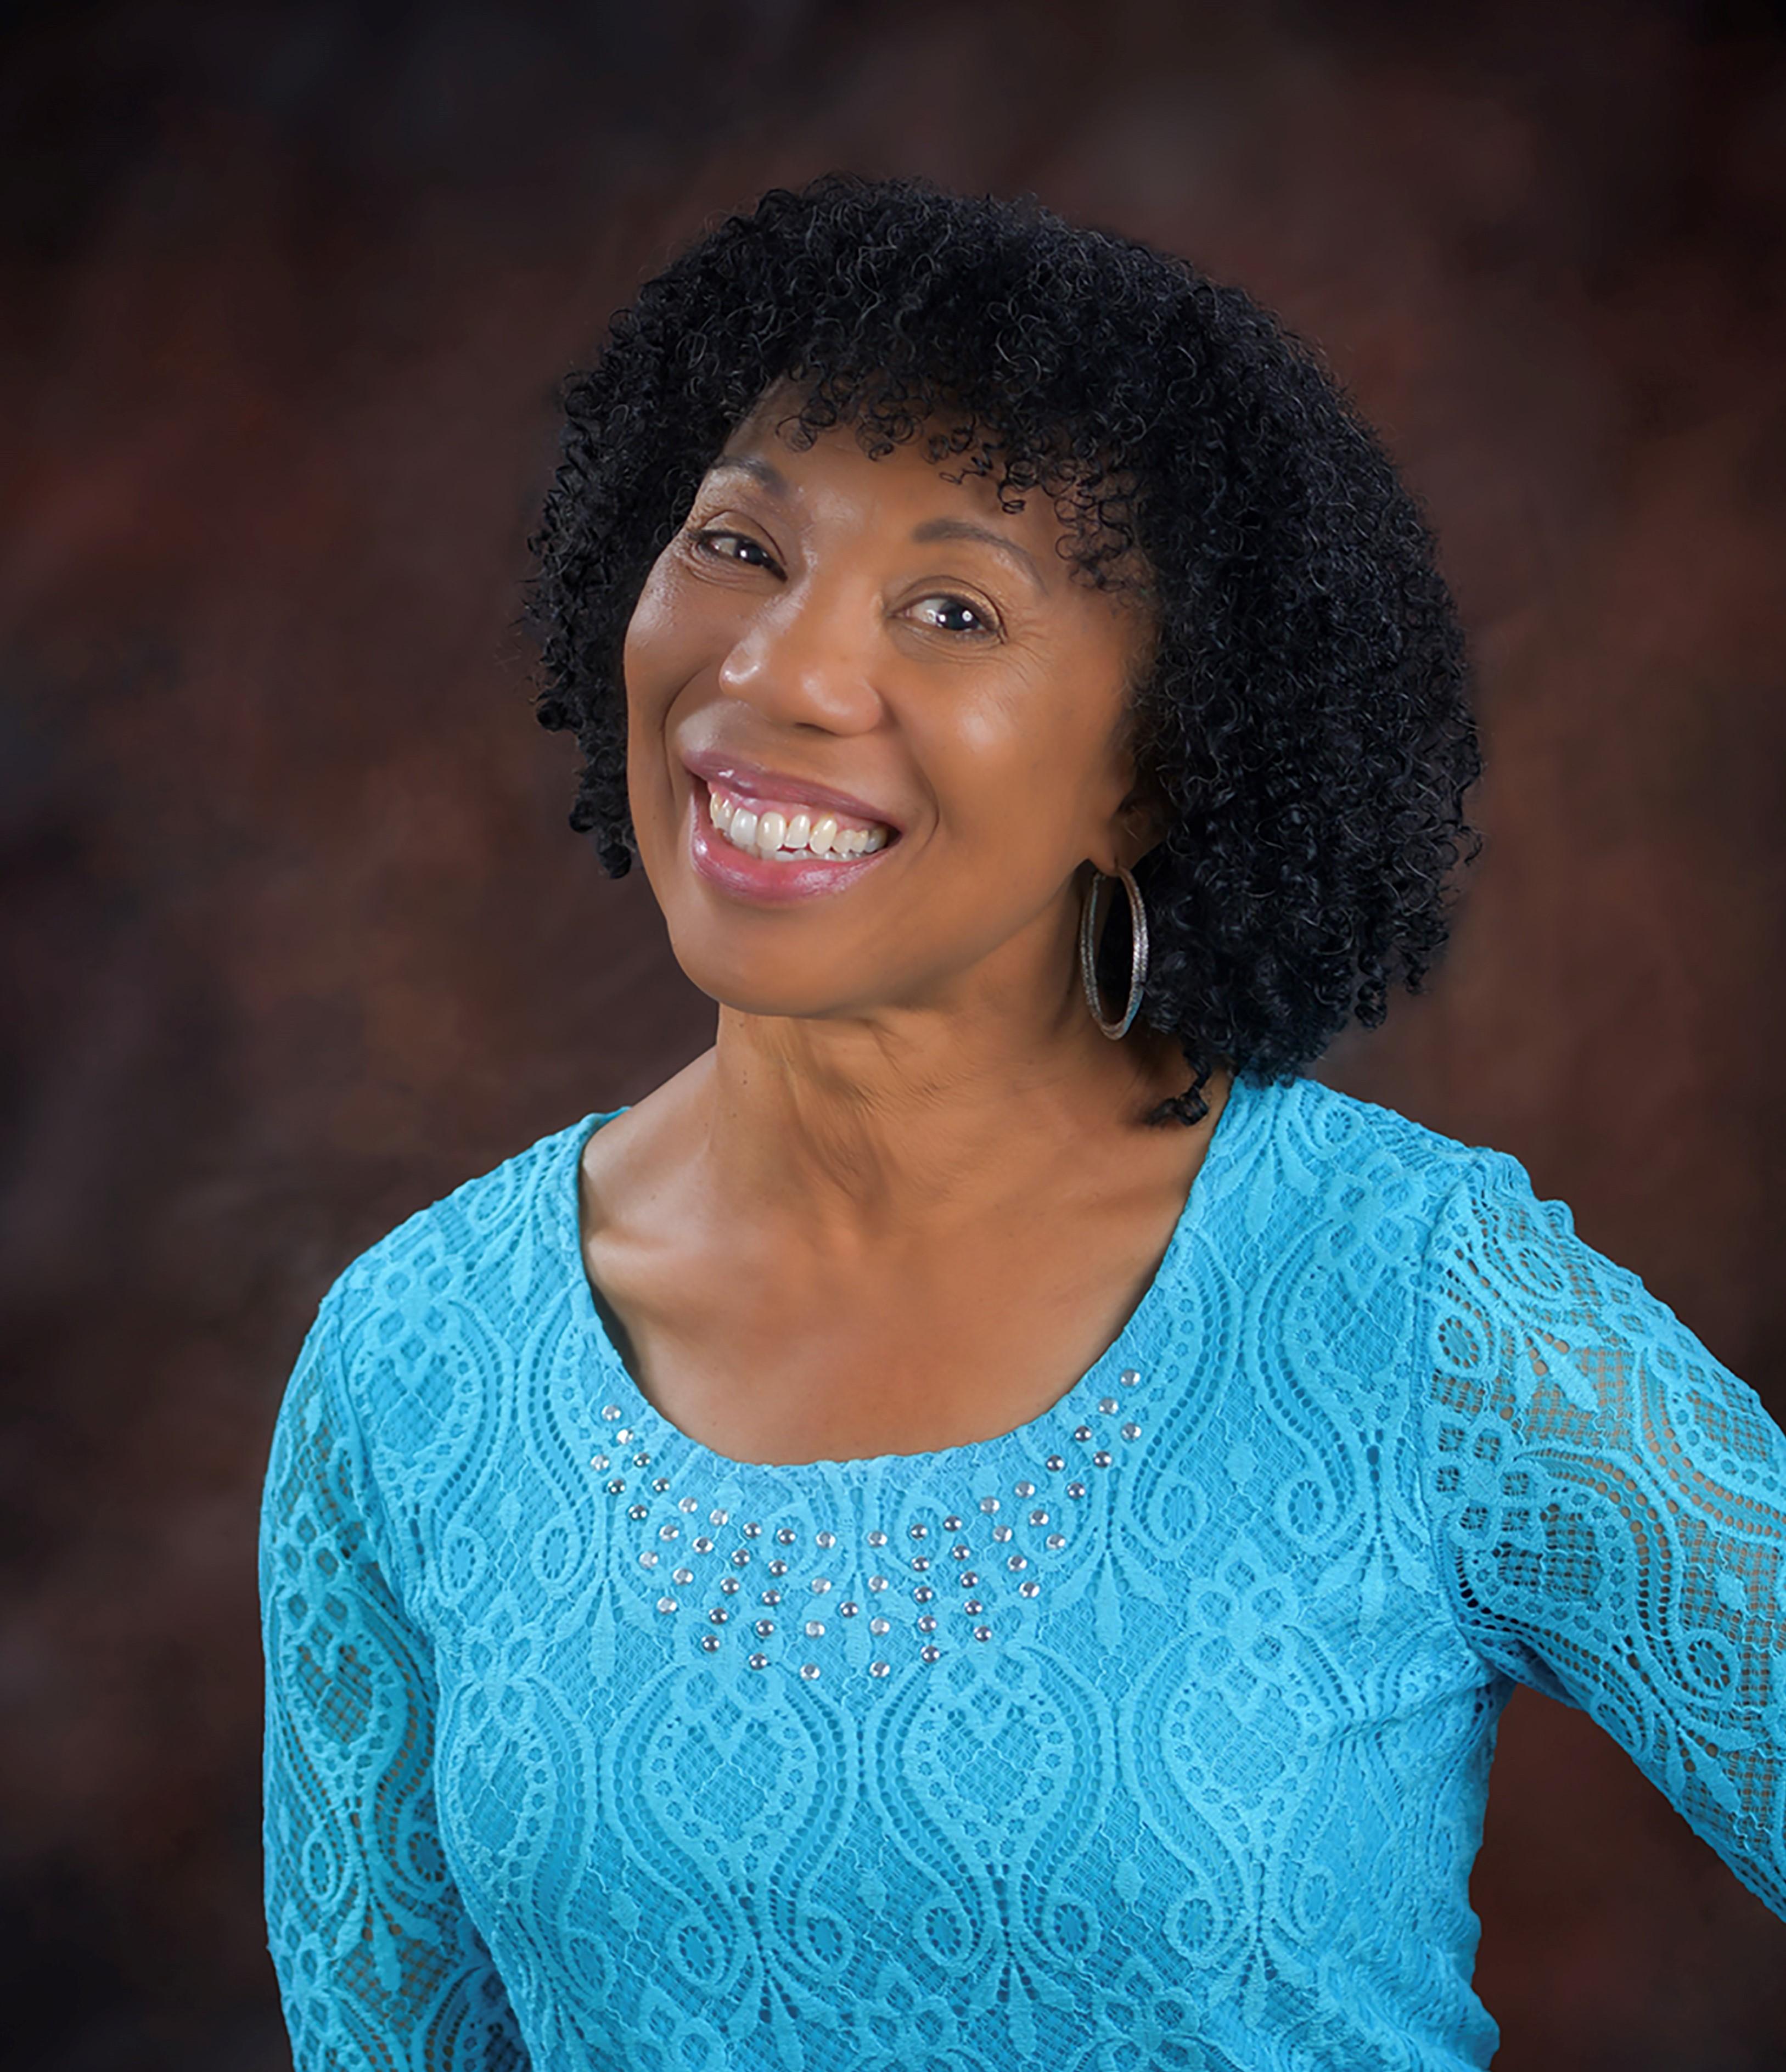 Suzanne Bowman Williams